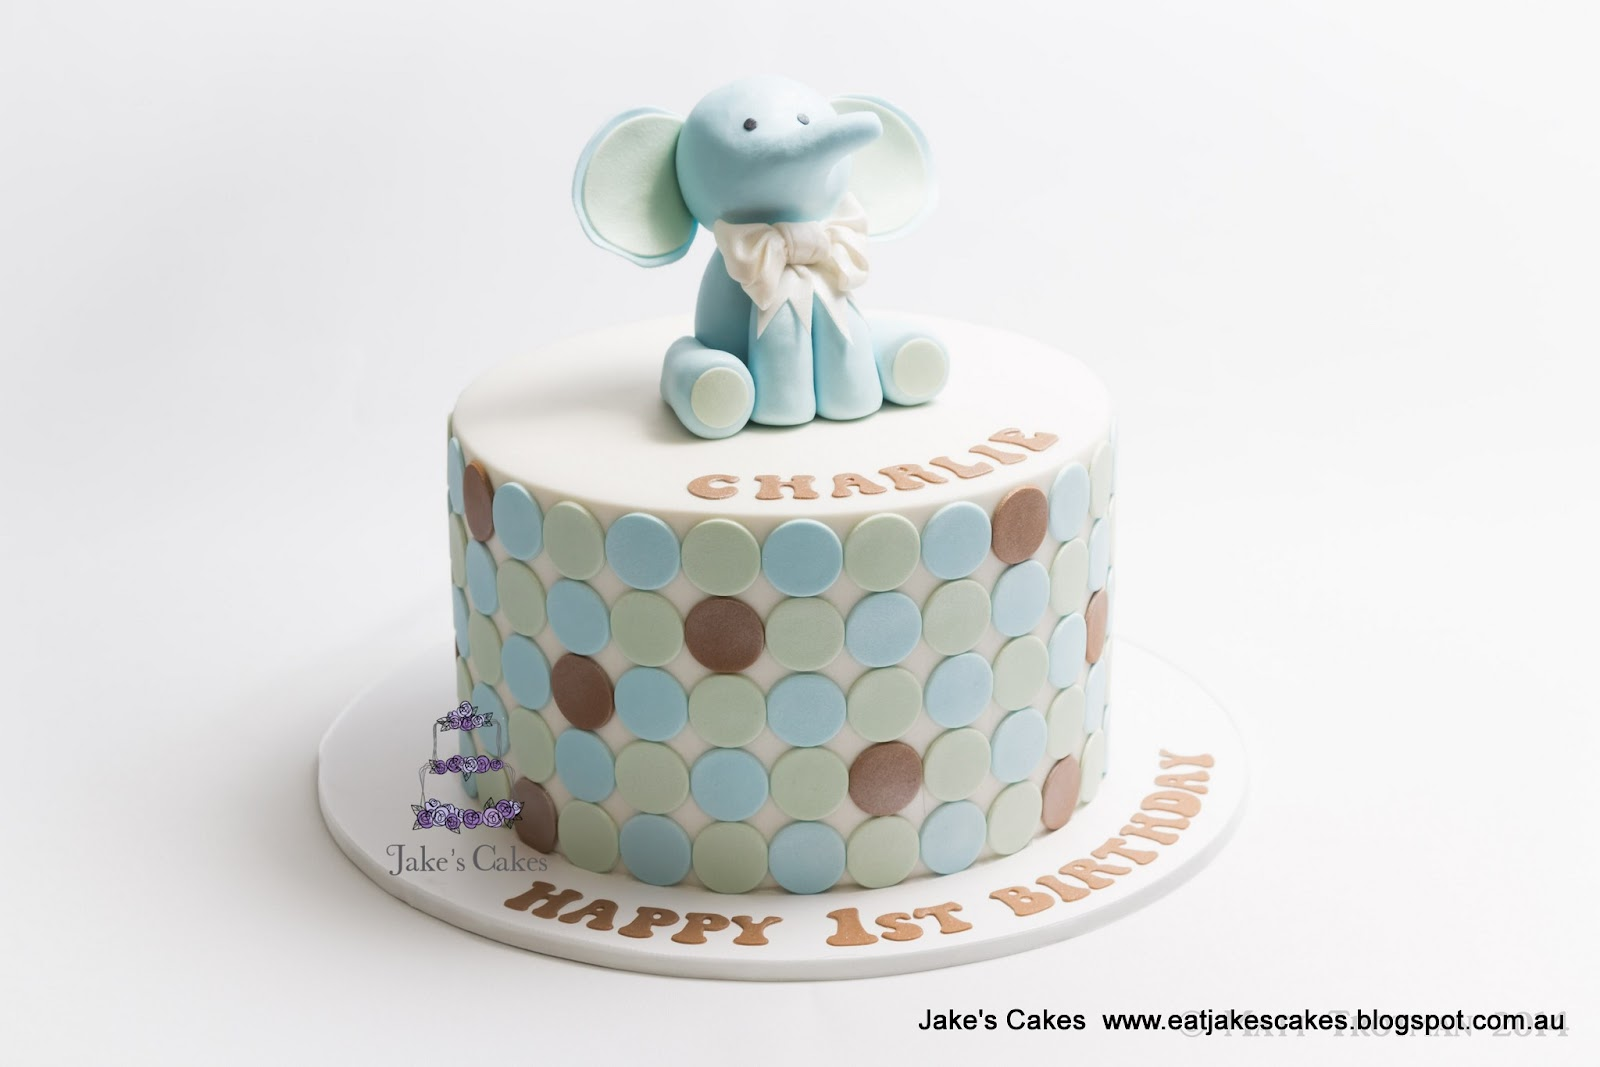 Birthday Cake Photos For 1st Birthday : Jake s Cakes: First Birthday Cake with Fondant Elephant ...